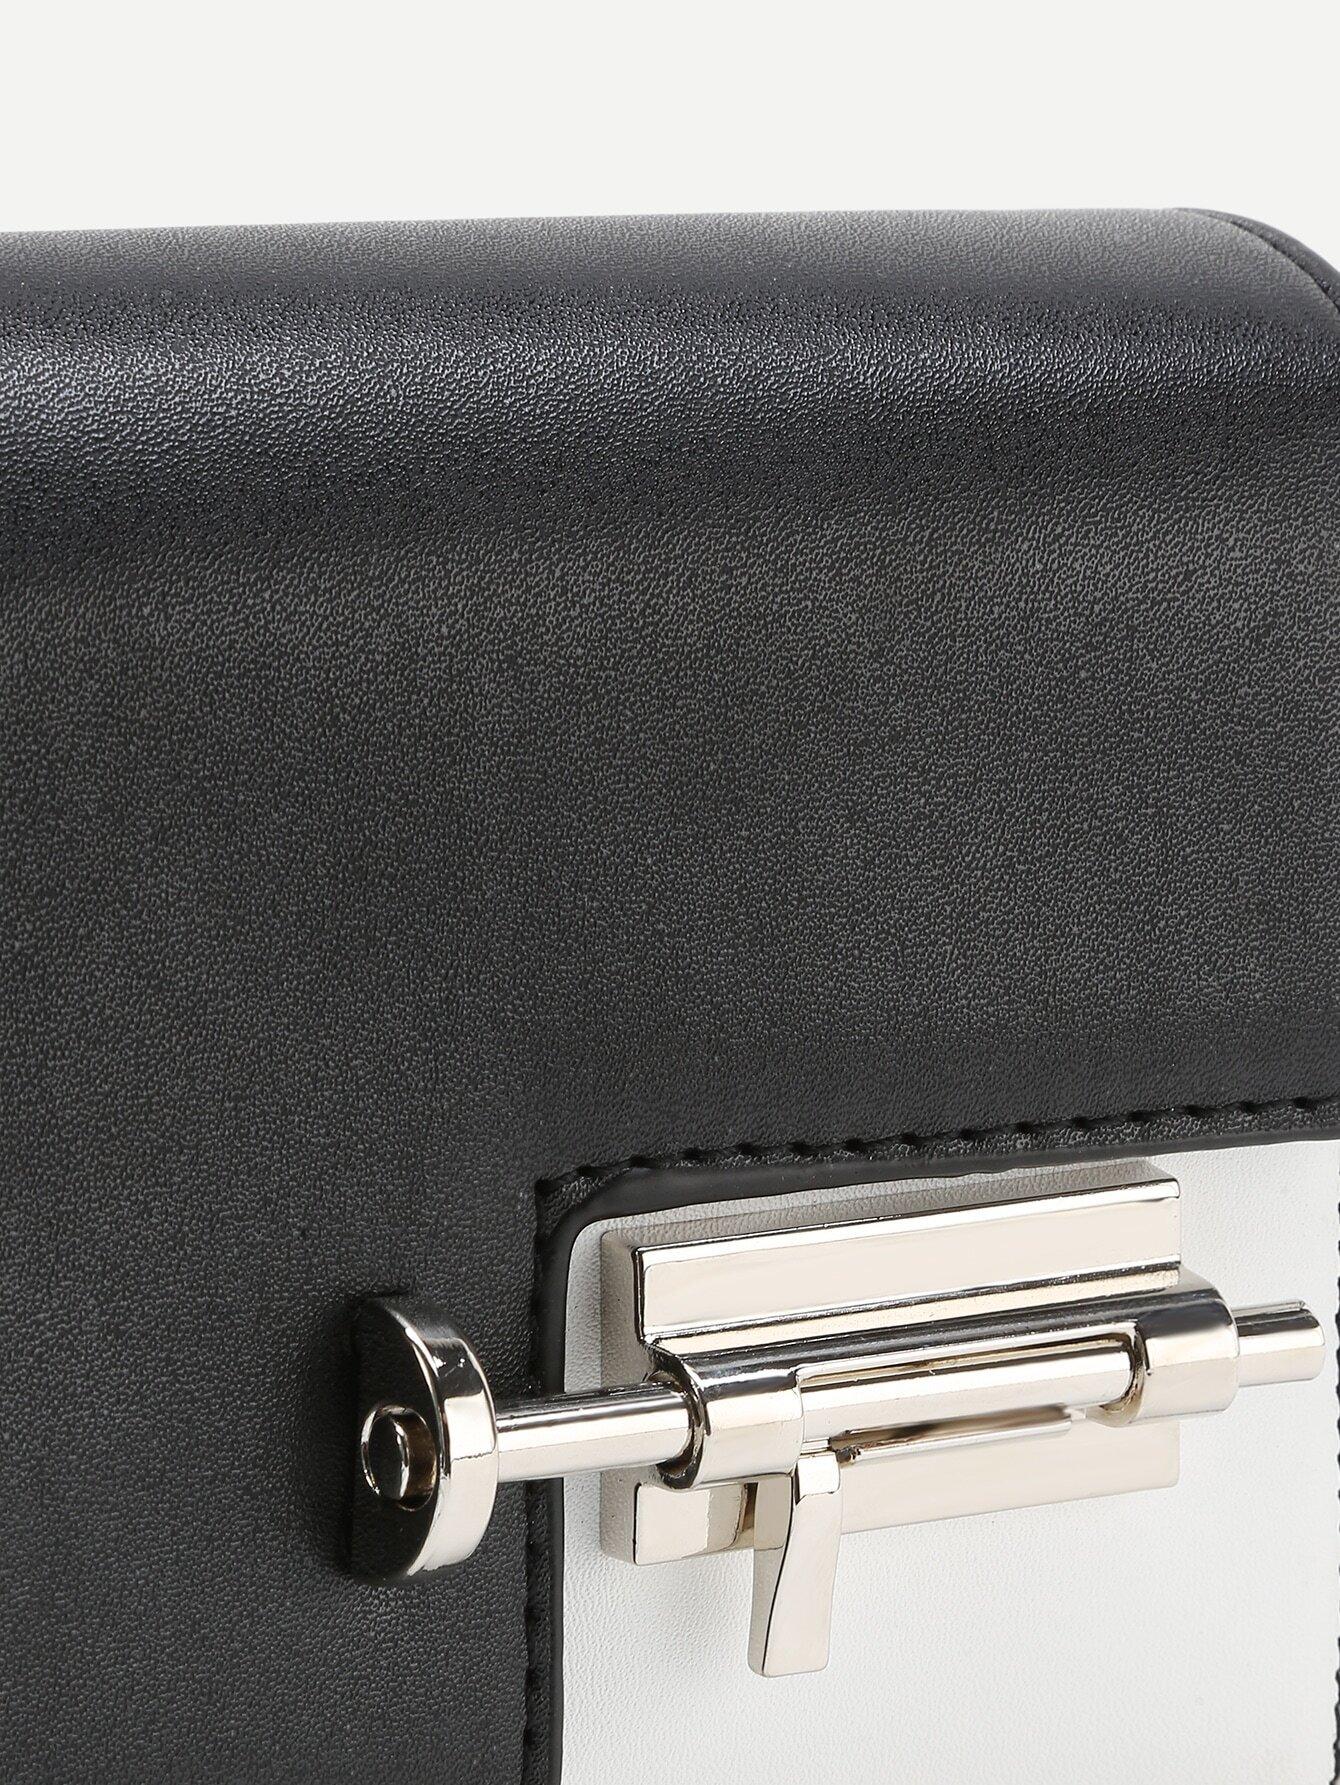 bag170515906_1